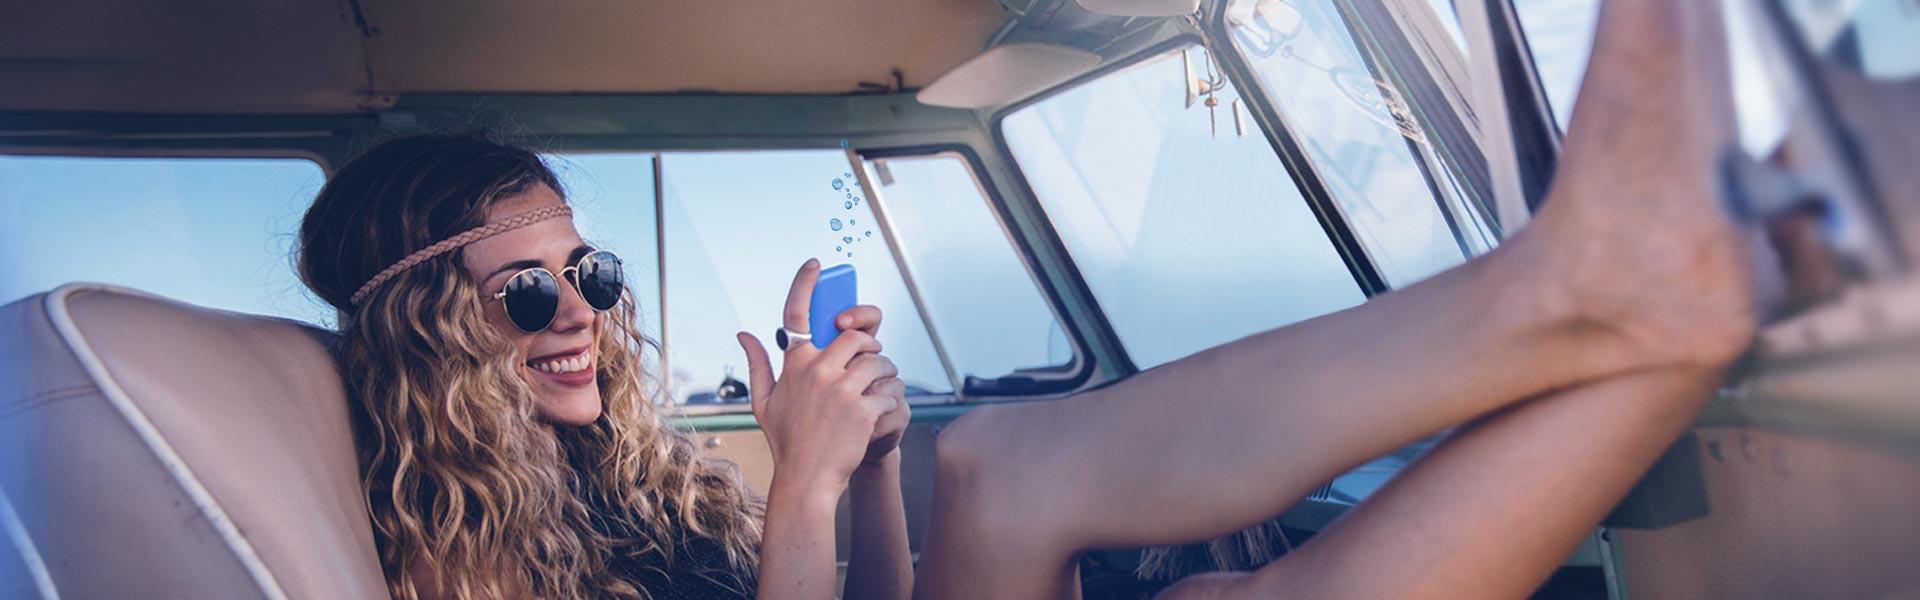 Vorgänger Smartphones